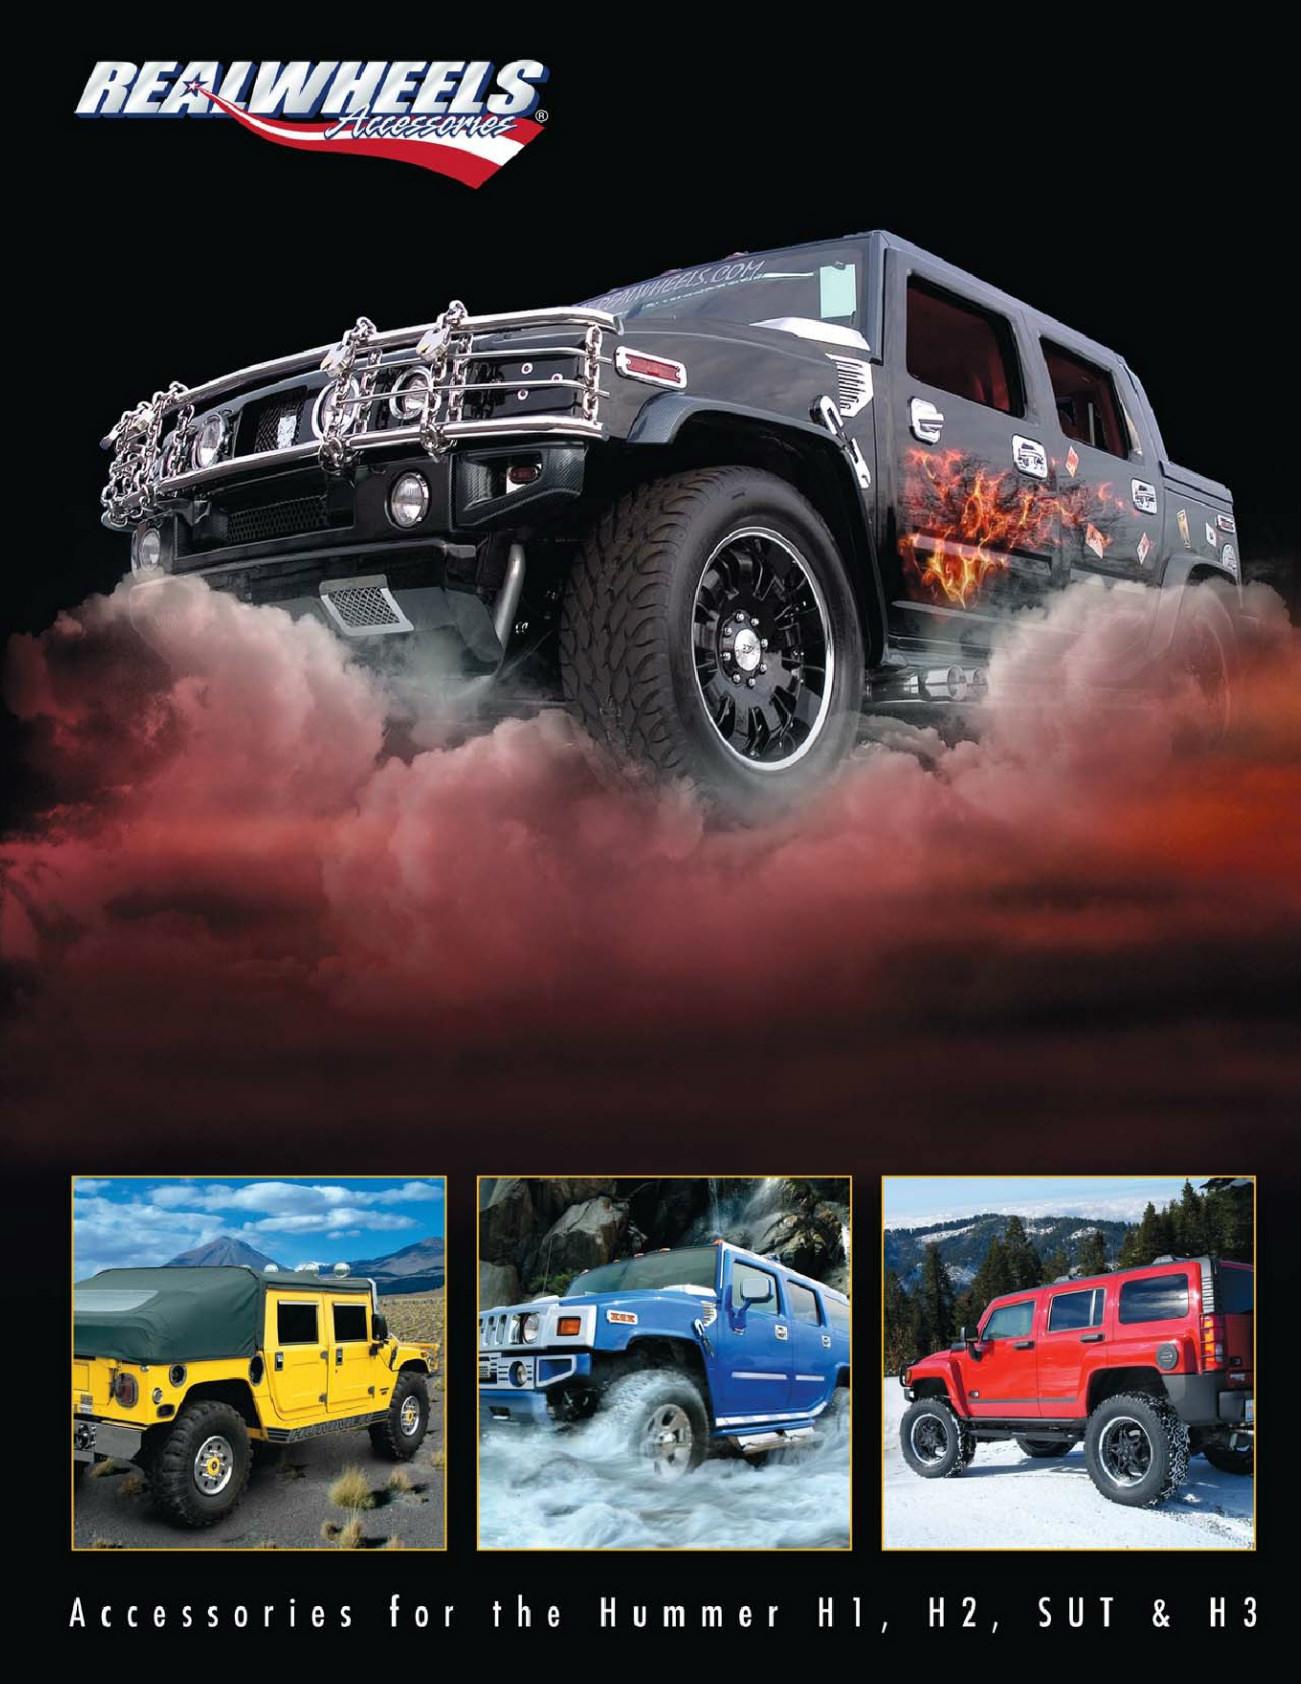 Hummer H1 Vs H2 : hummer, RealWheels, Hummer, Accessories, Catalog